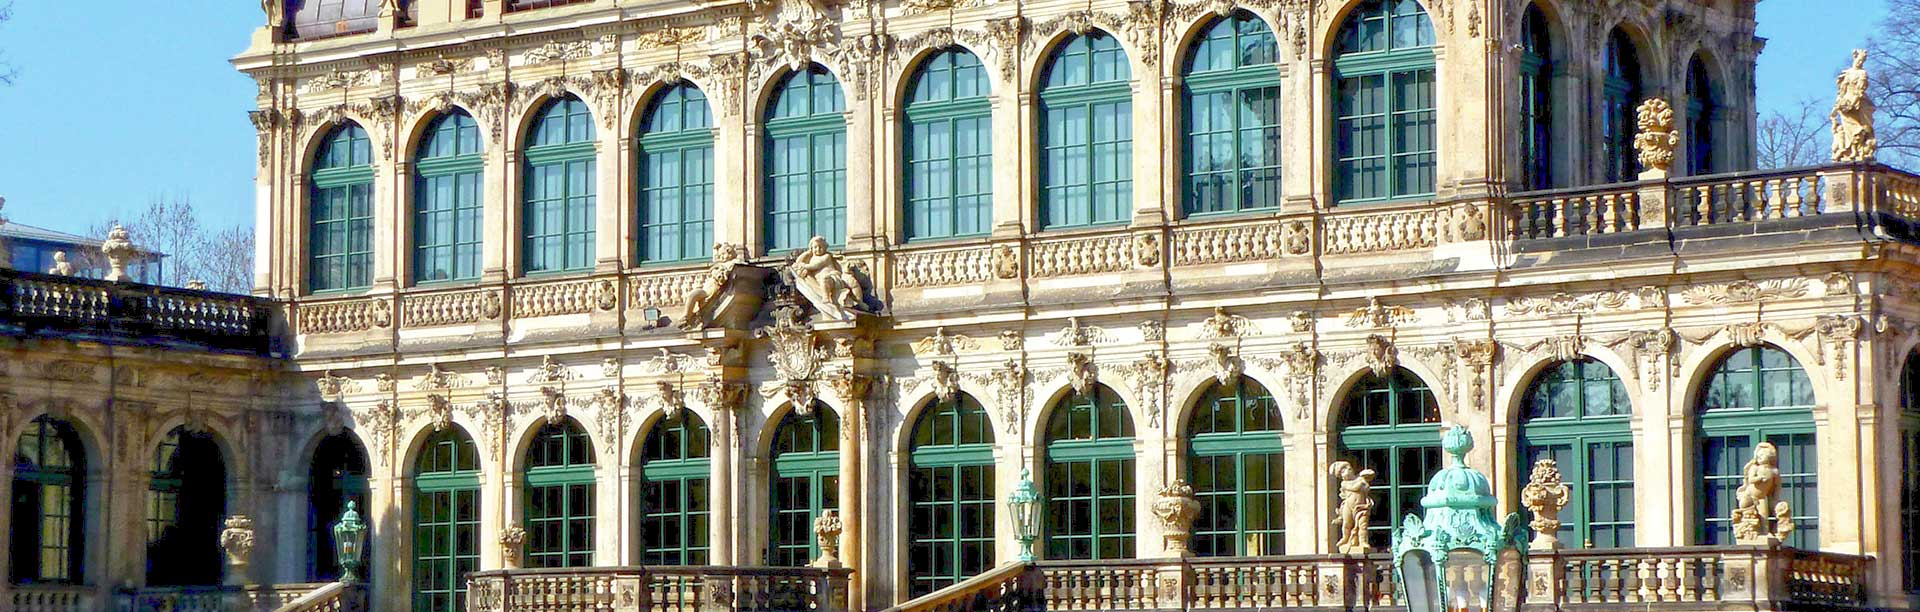 окна барокко